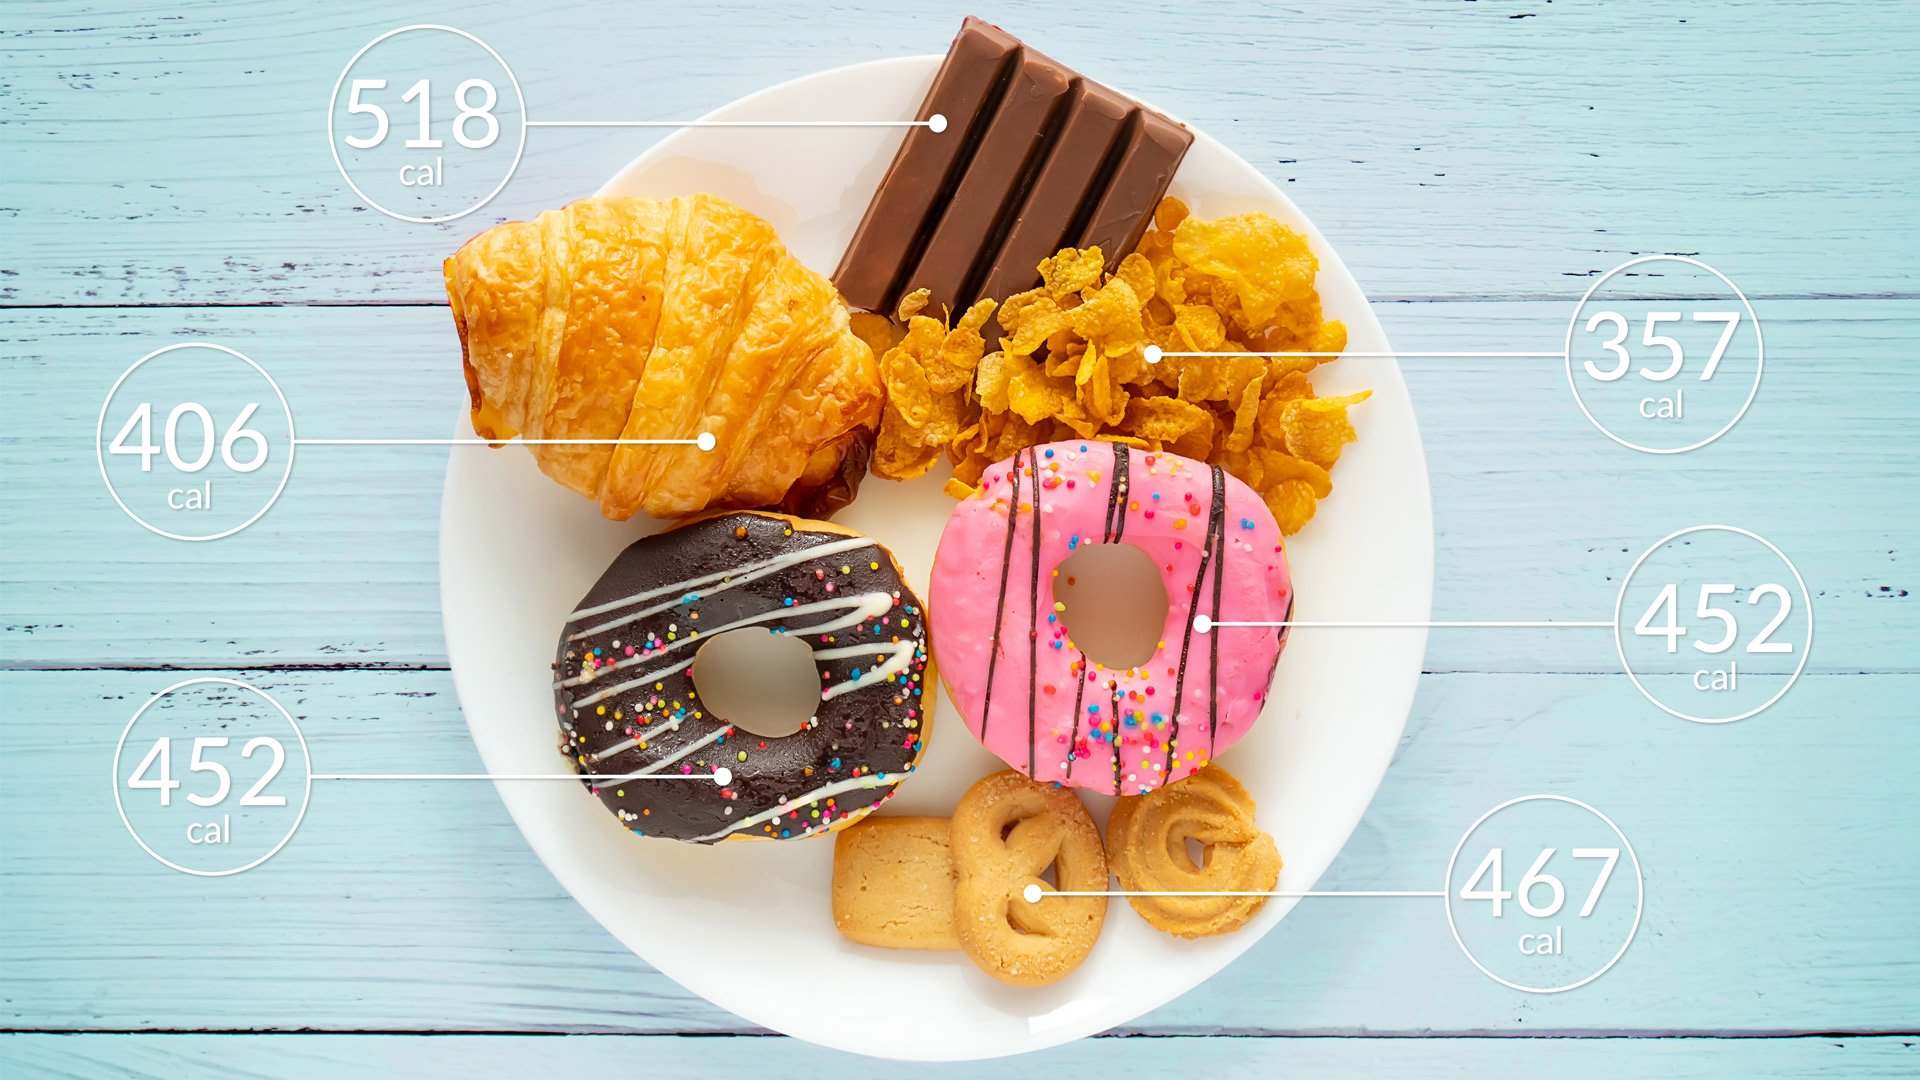 calorieen-ongezond